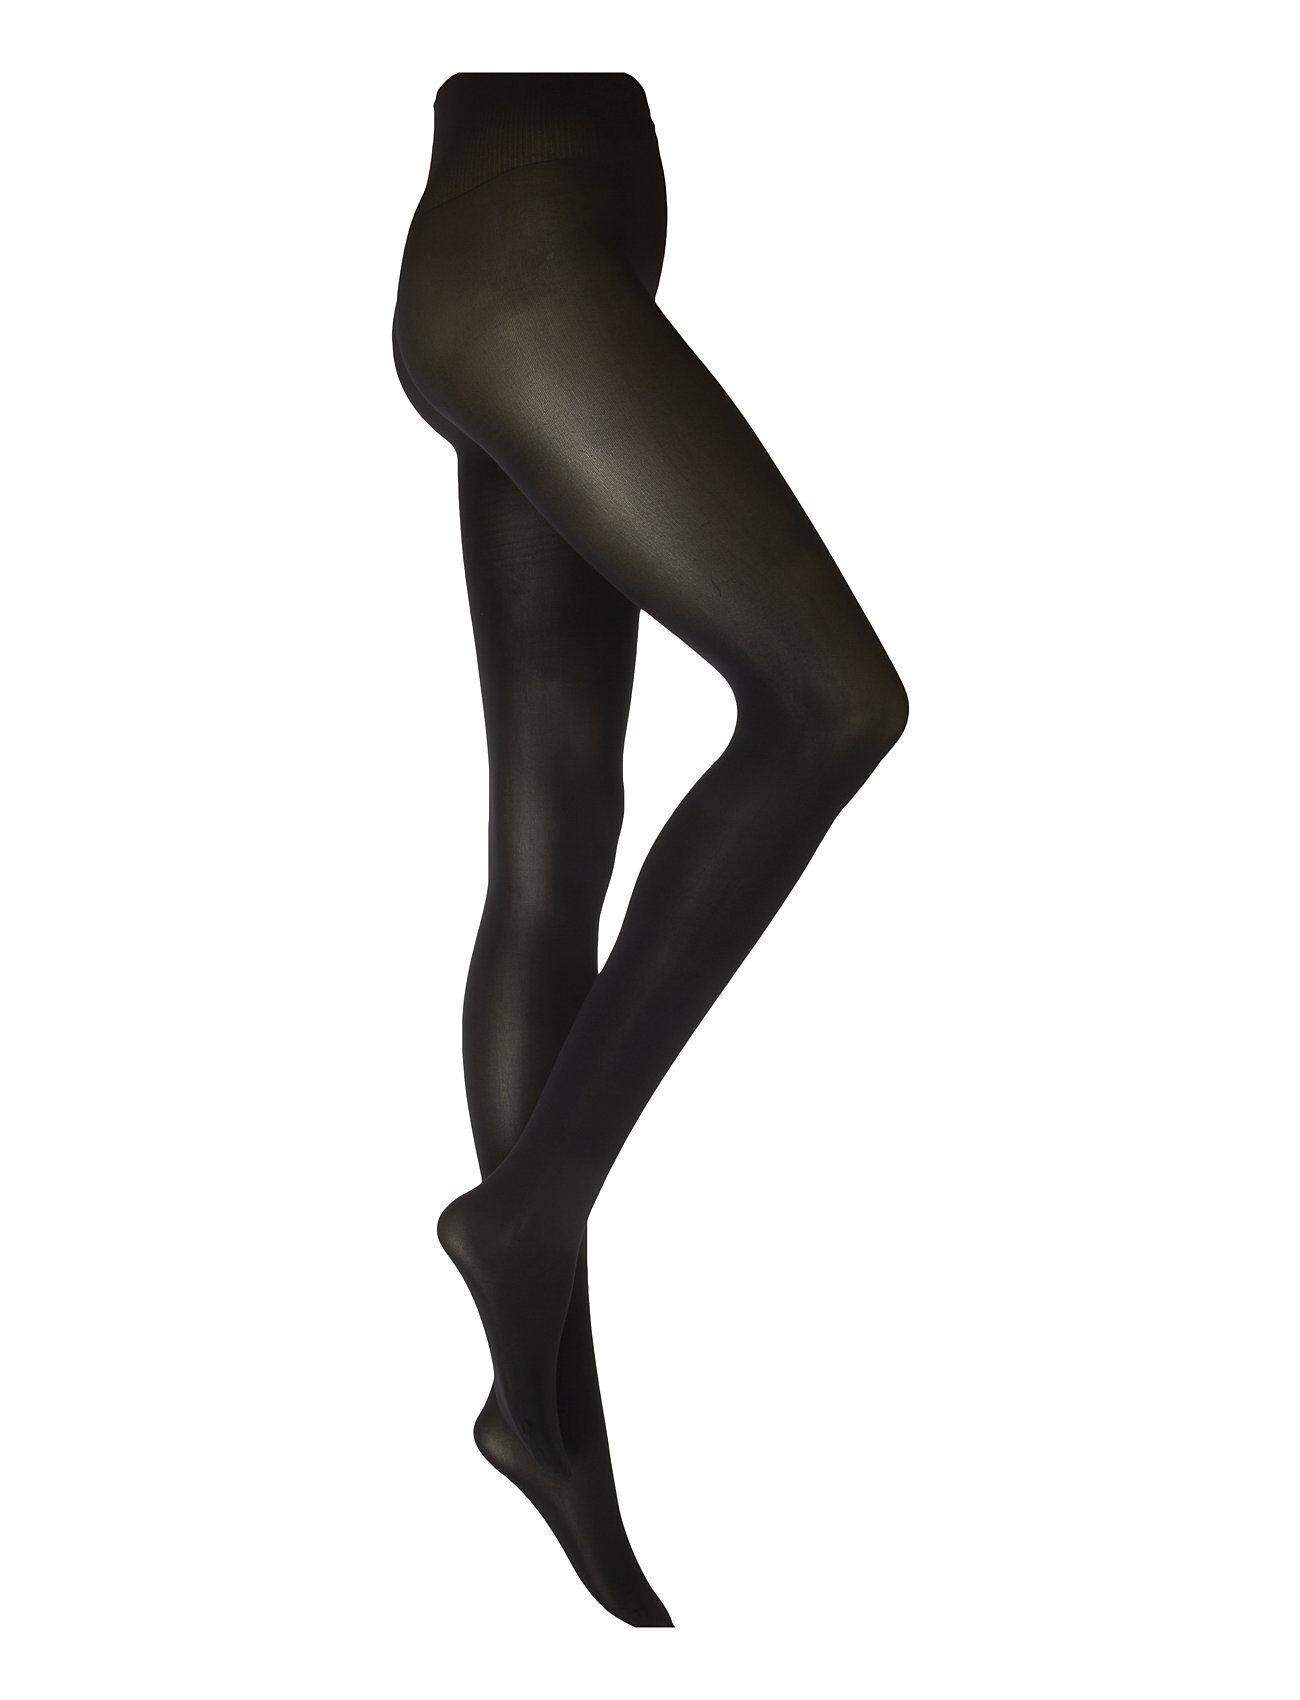 Swedish Stockings Olivia Premium Tights 60d Sukkahousut Musta Swedish Stockings